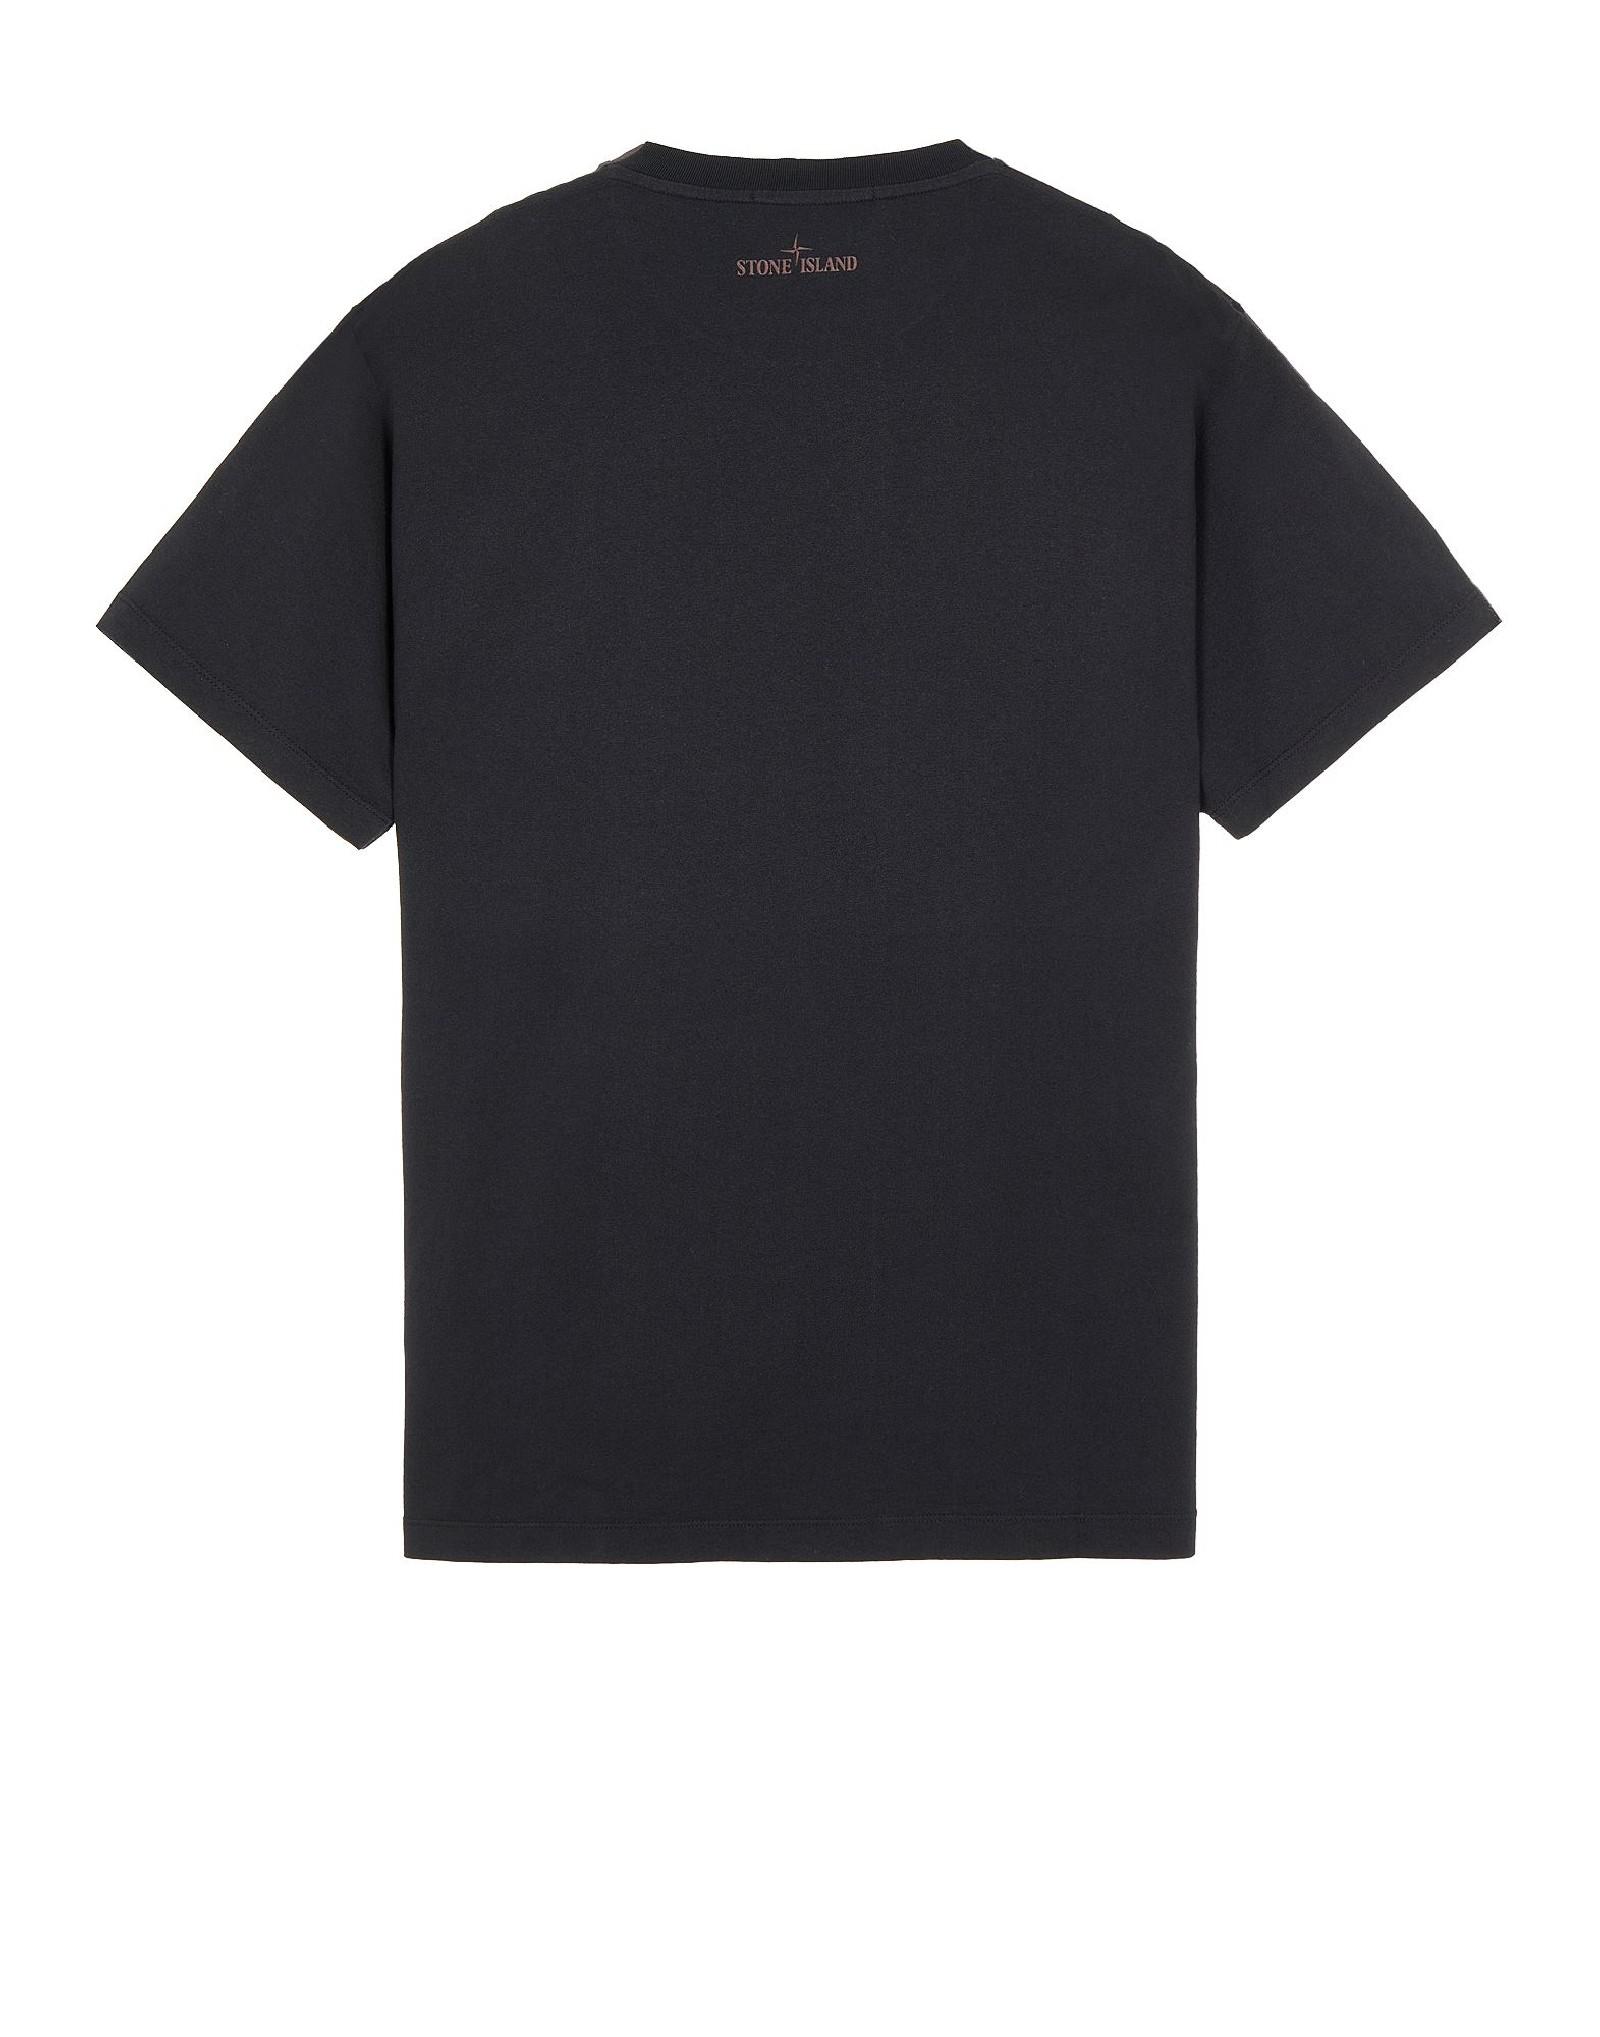 STONE ISLAND | T-shirt | MO74152NS86V0029